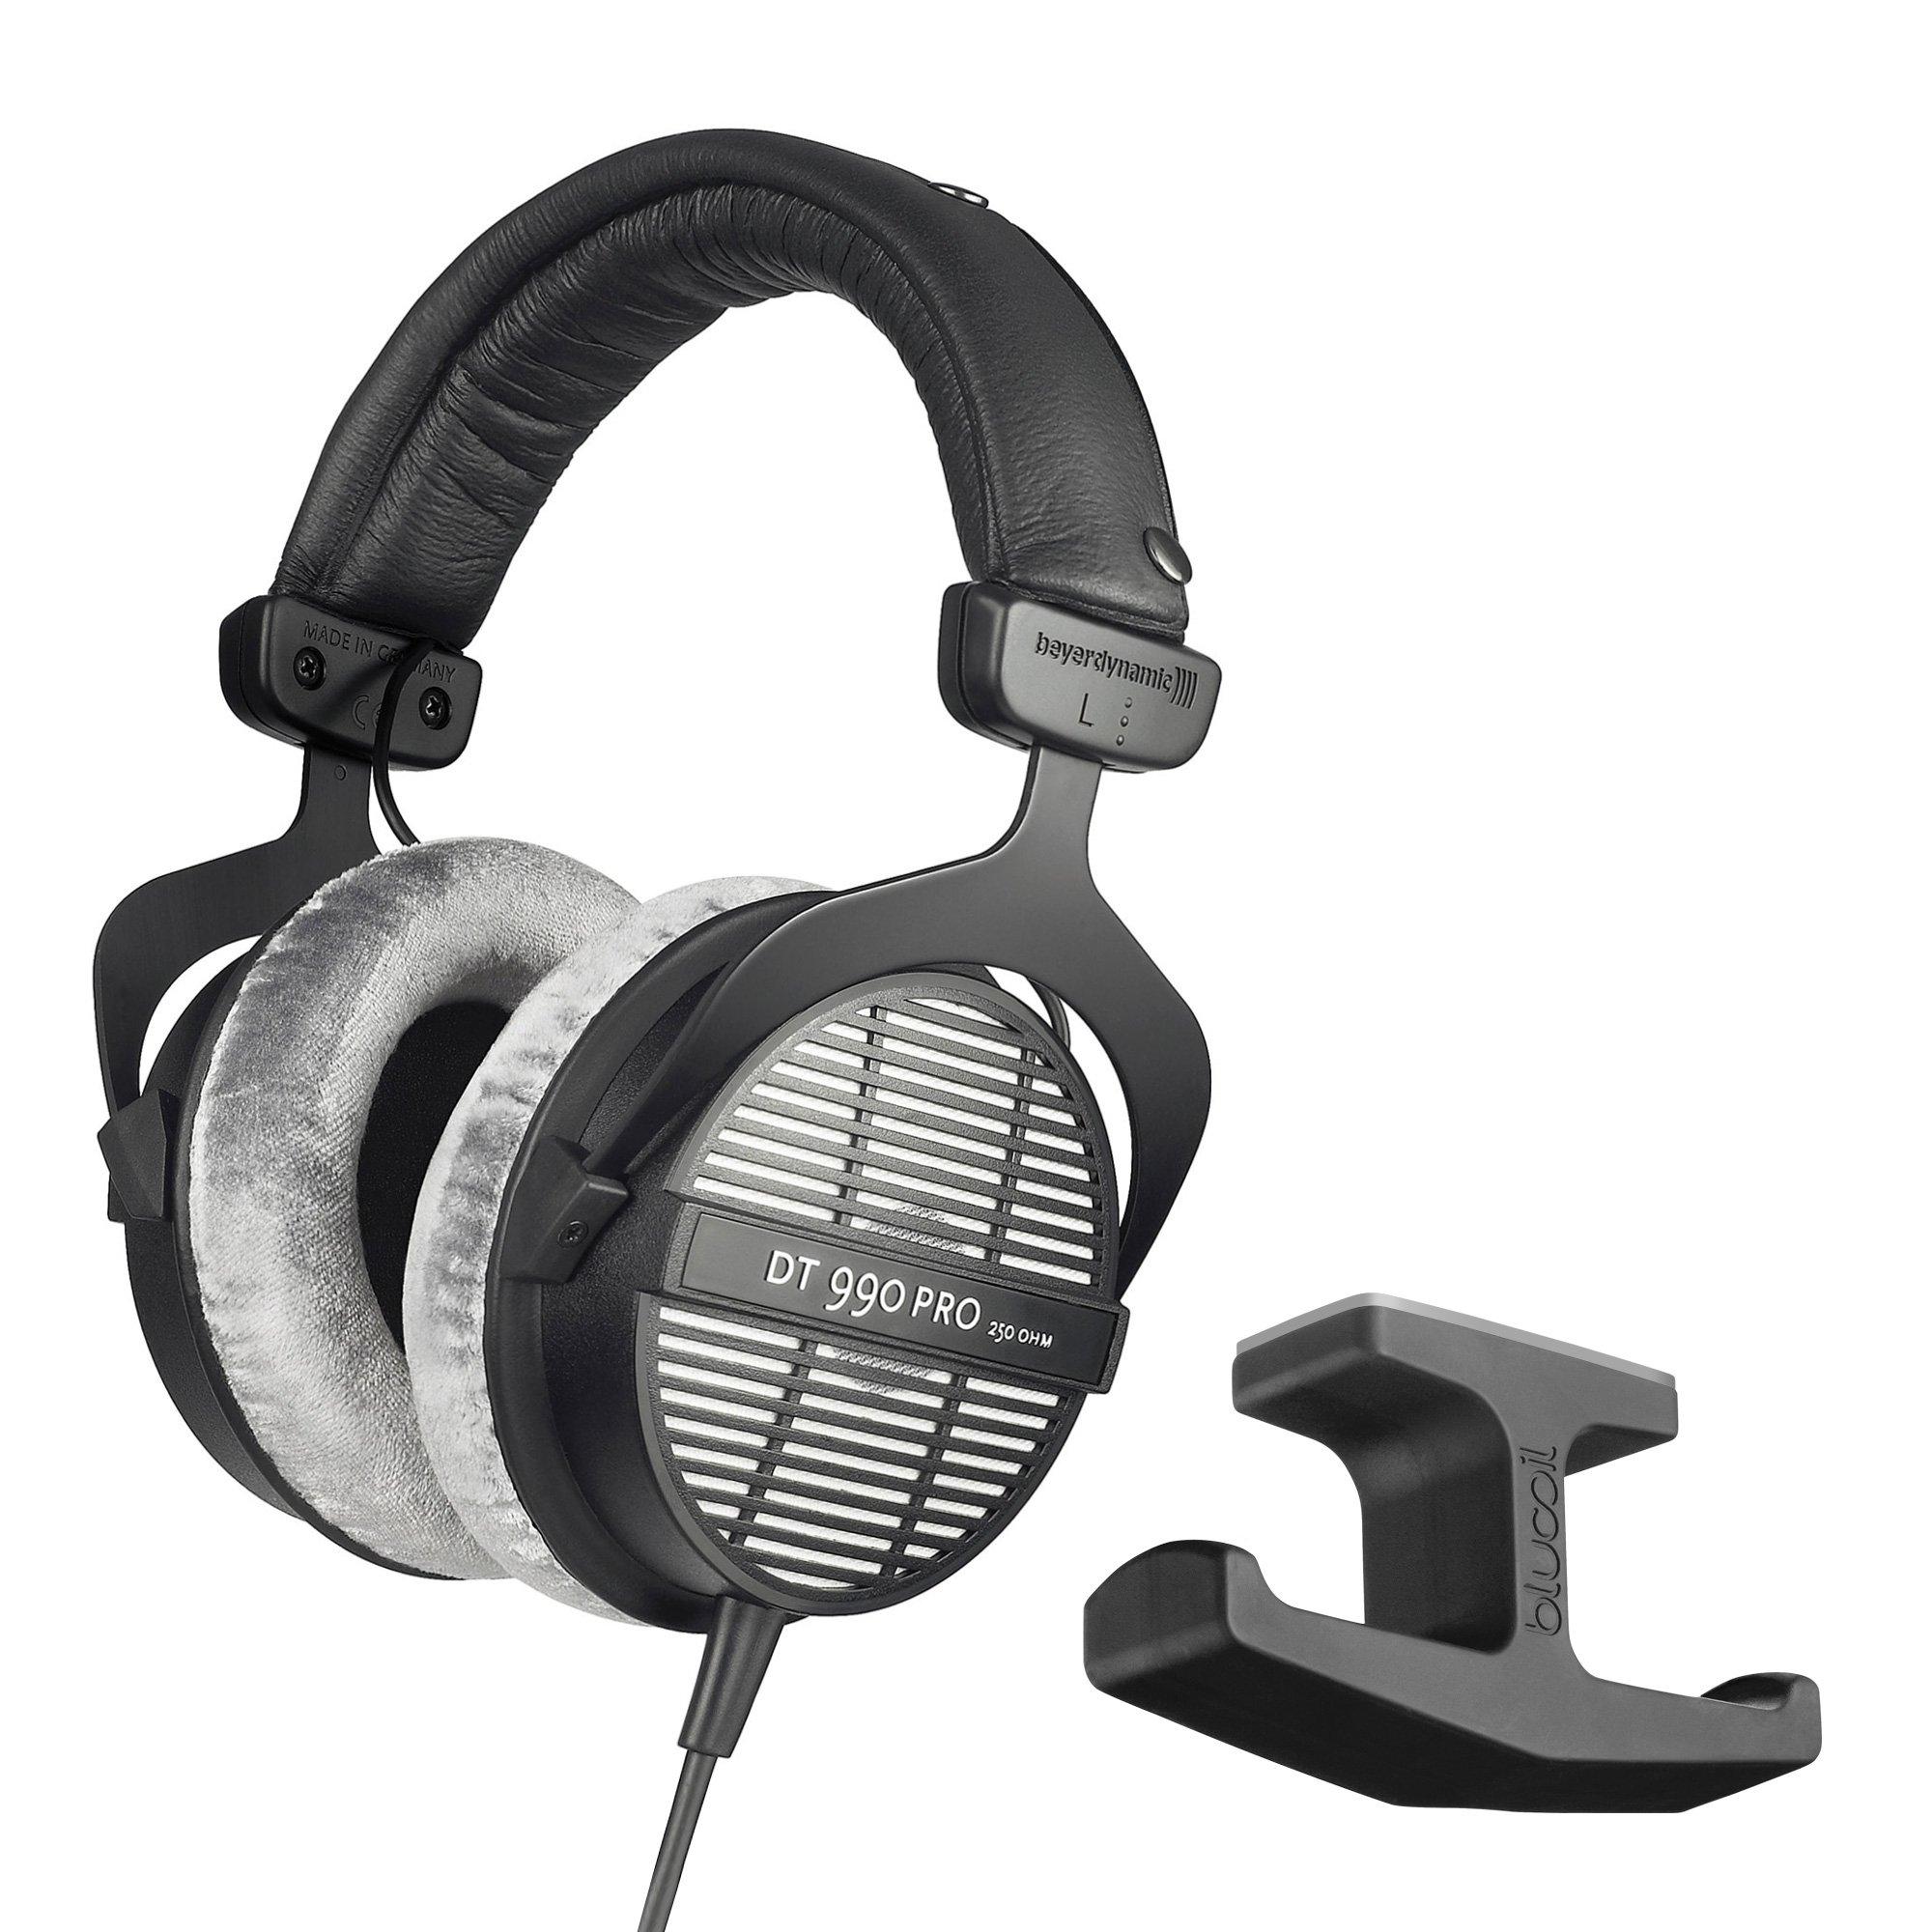 Beyerdynamic DT 990 PRO 250Ohm Open Studio Headphones -INCLUDES- Blucoil Stick-On Under Desk Dual Headphone Stand Mount